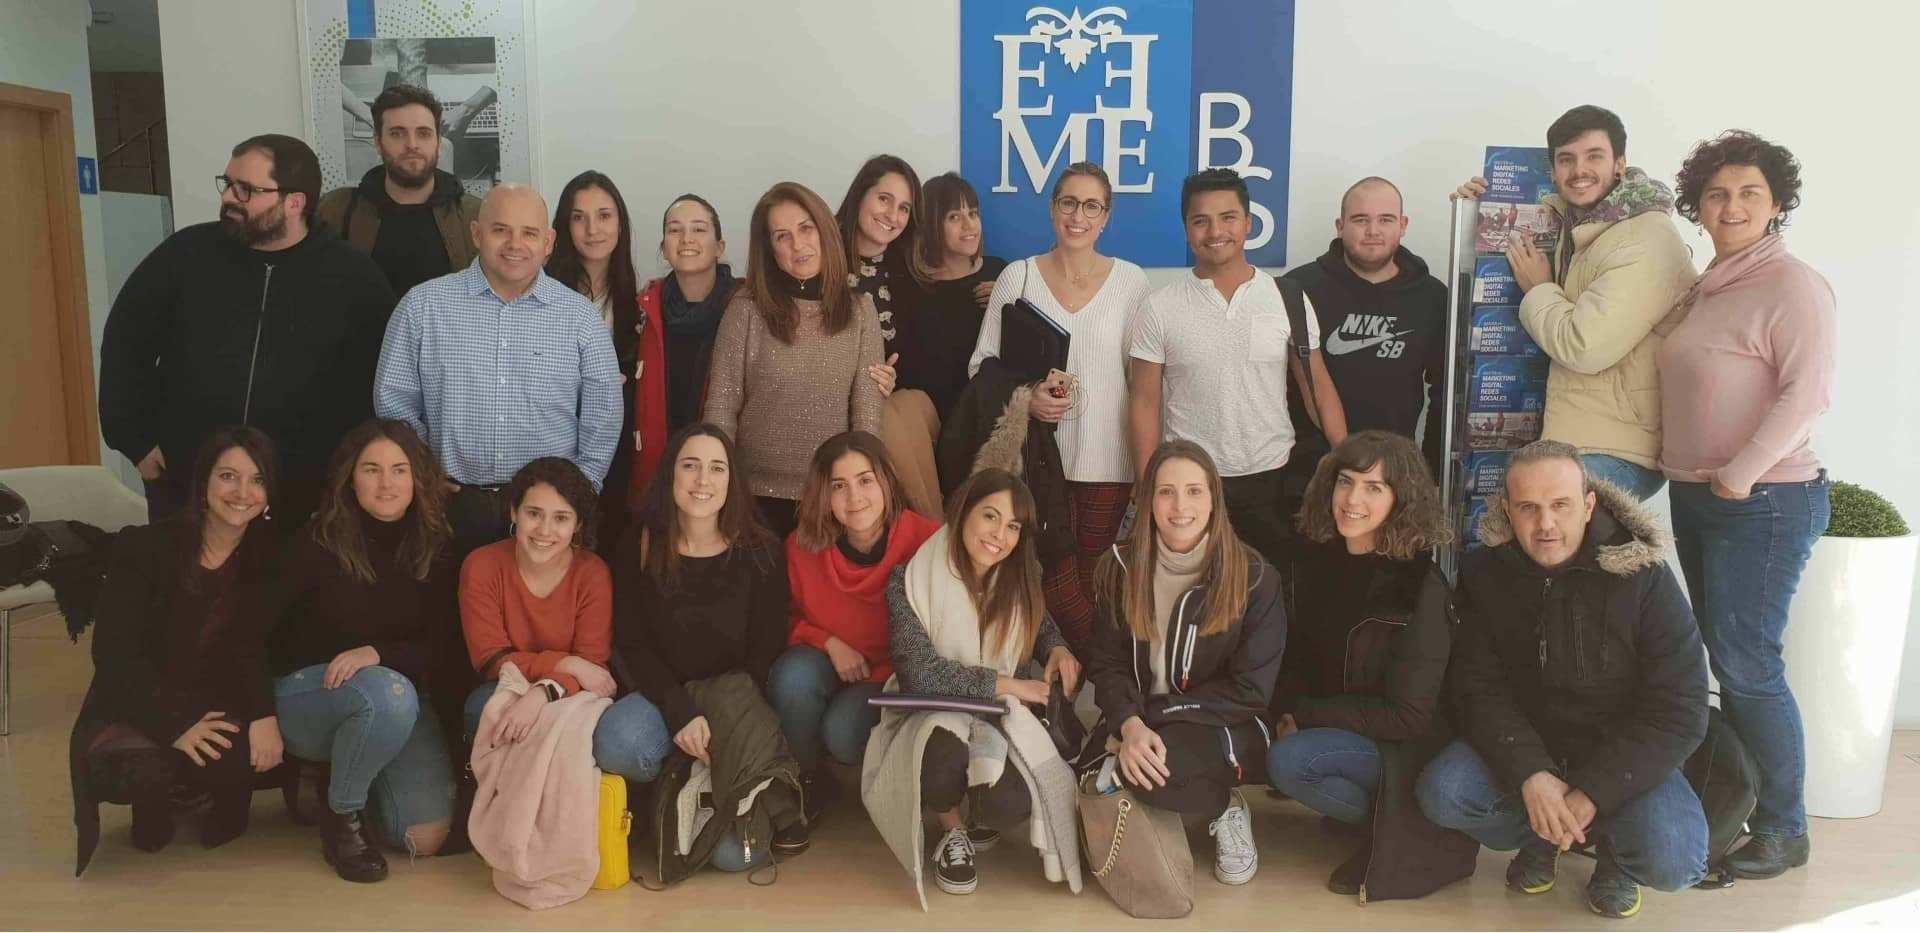 2019 EEME Alicante 2